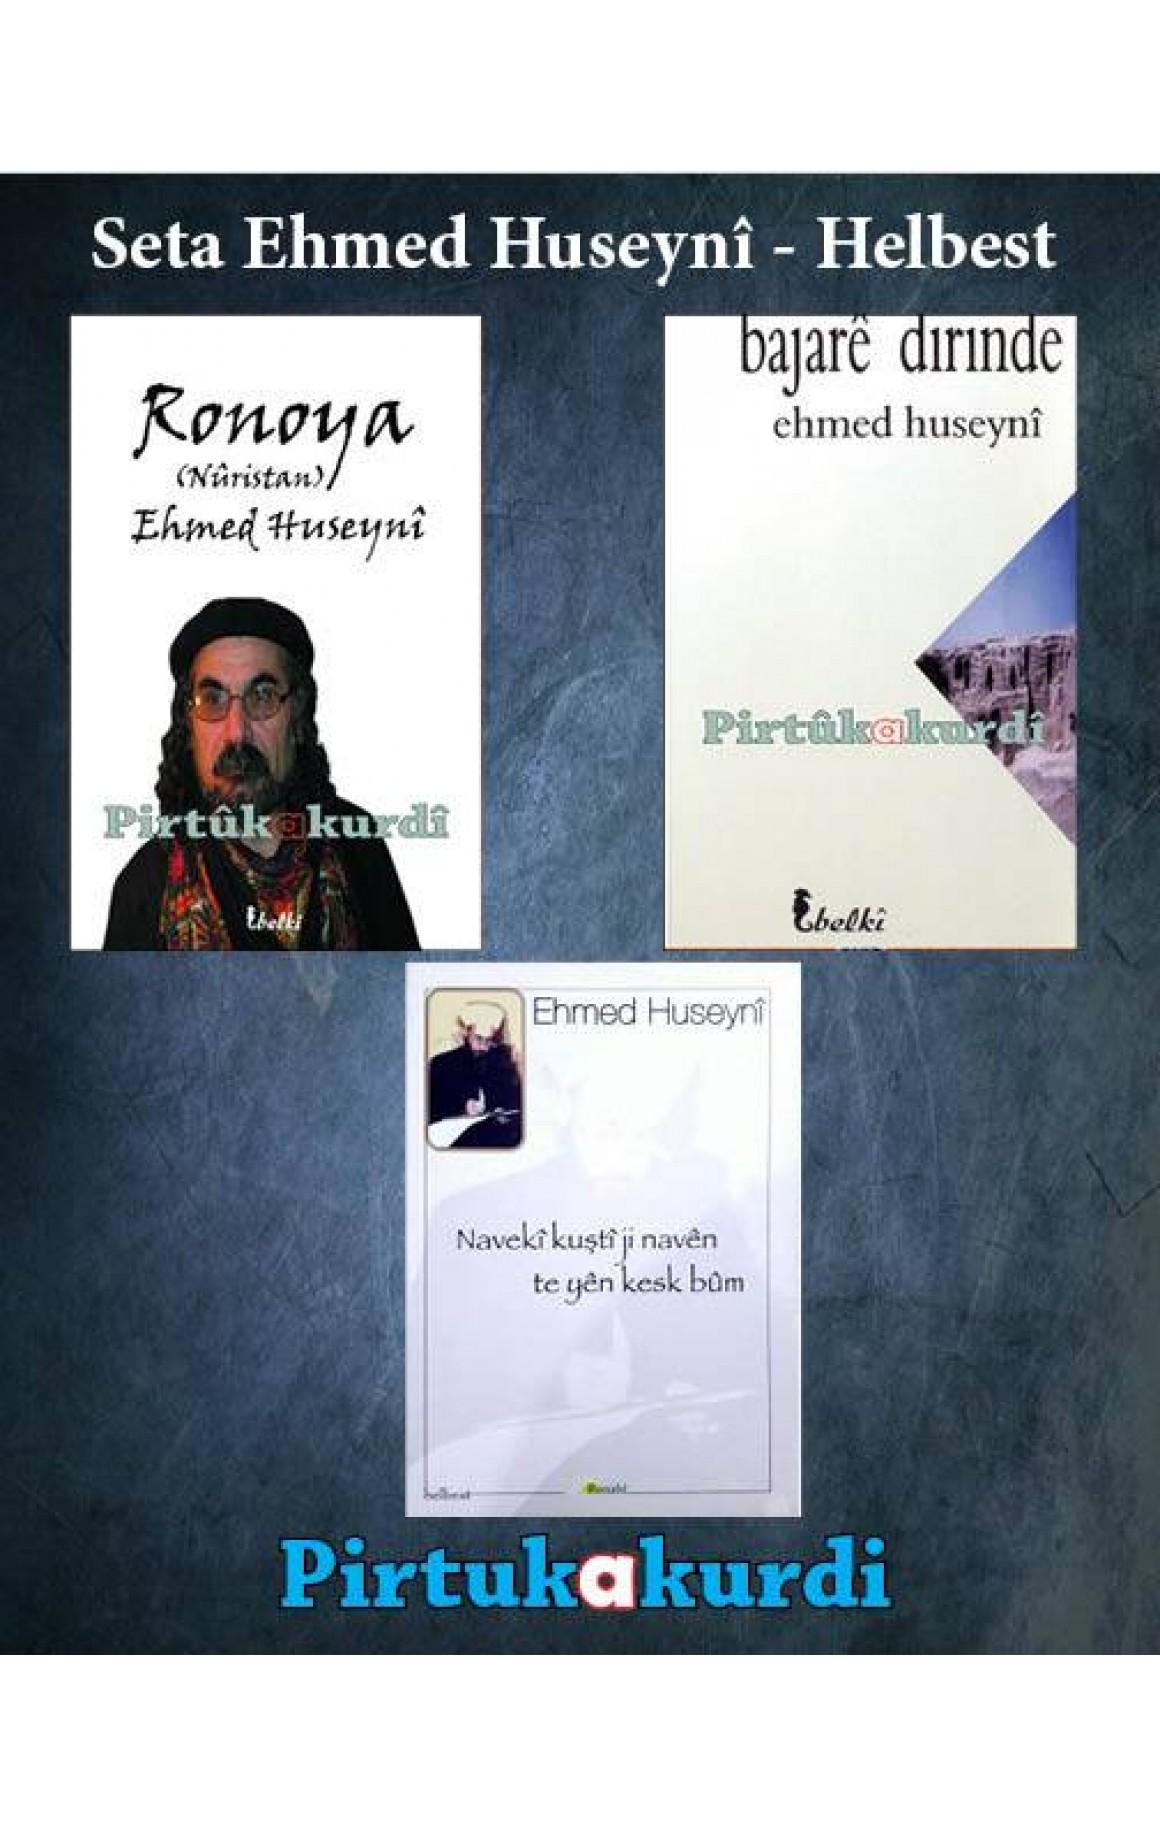 Seta Ehmed Huseynî - Helbest